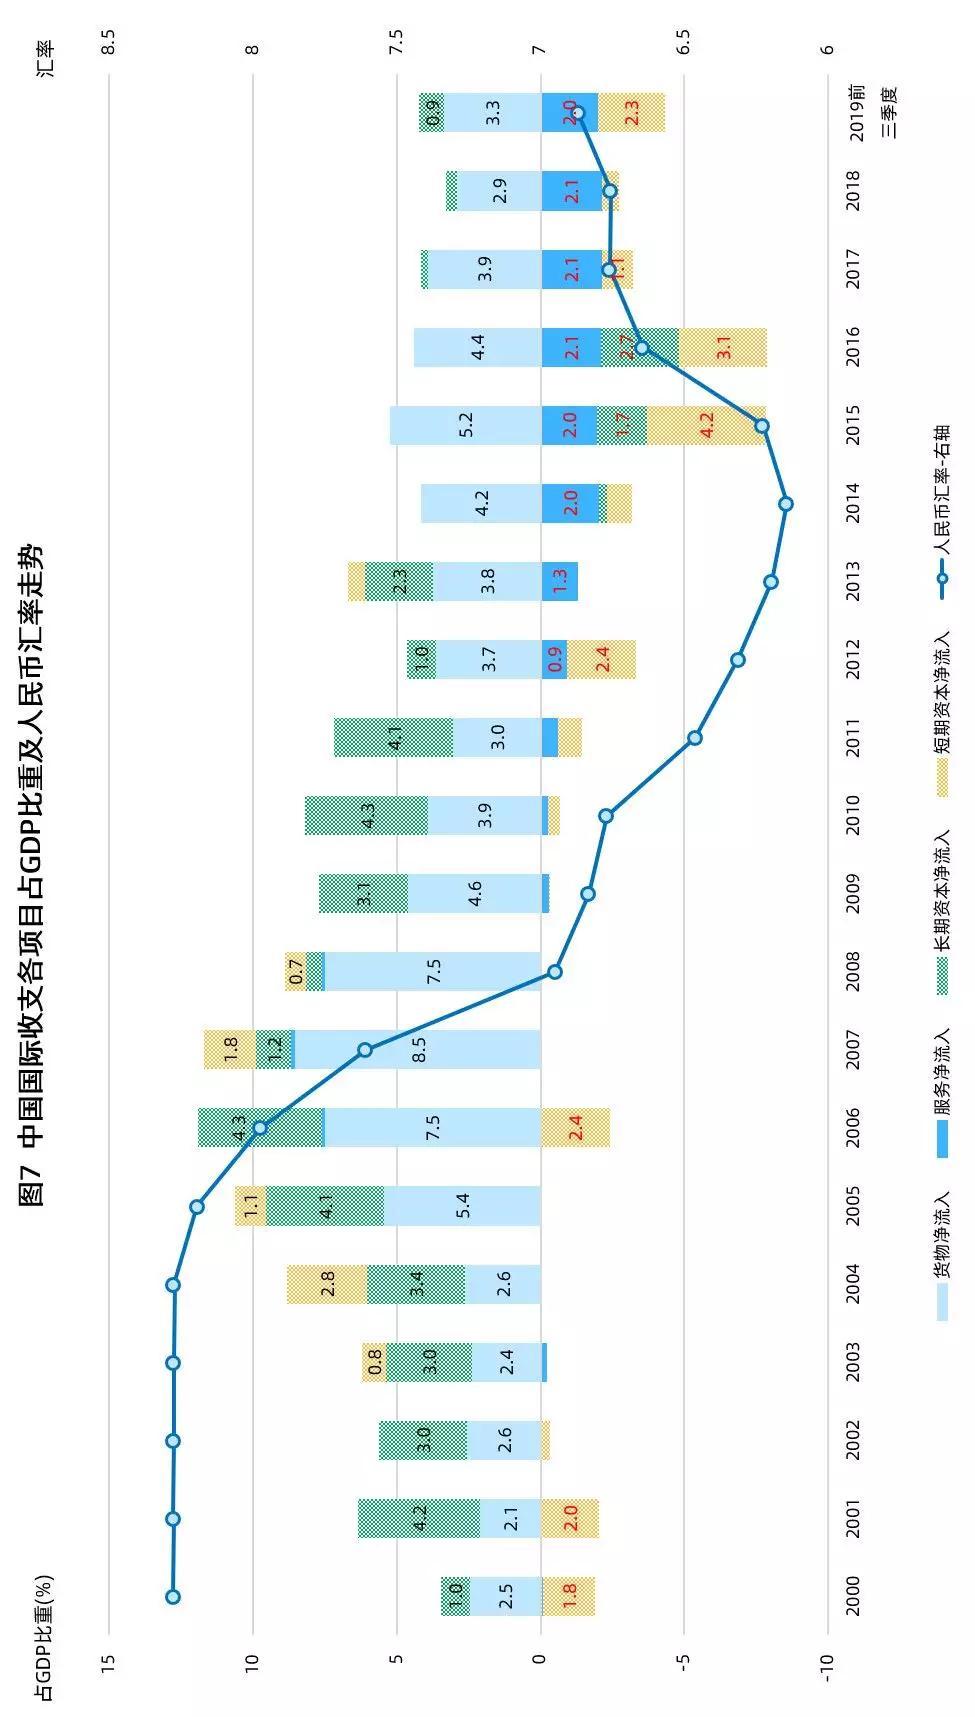 gdp口径_光大证券 省级GDP暗藏玄机 环保督察负面影响在缩小(2)